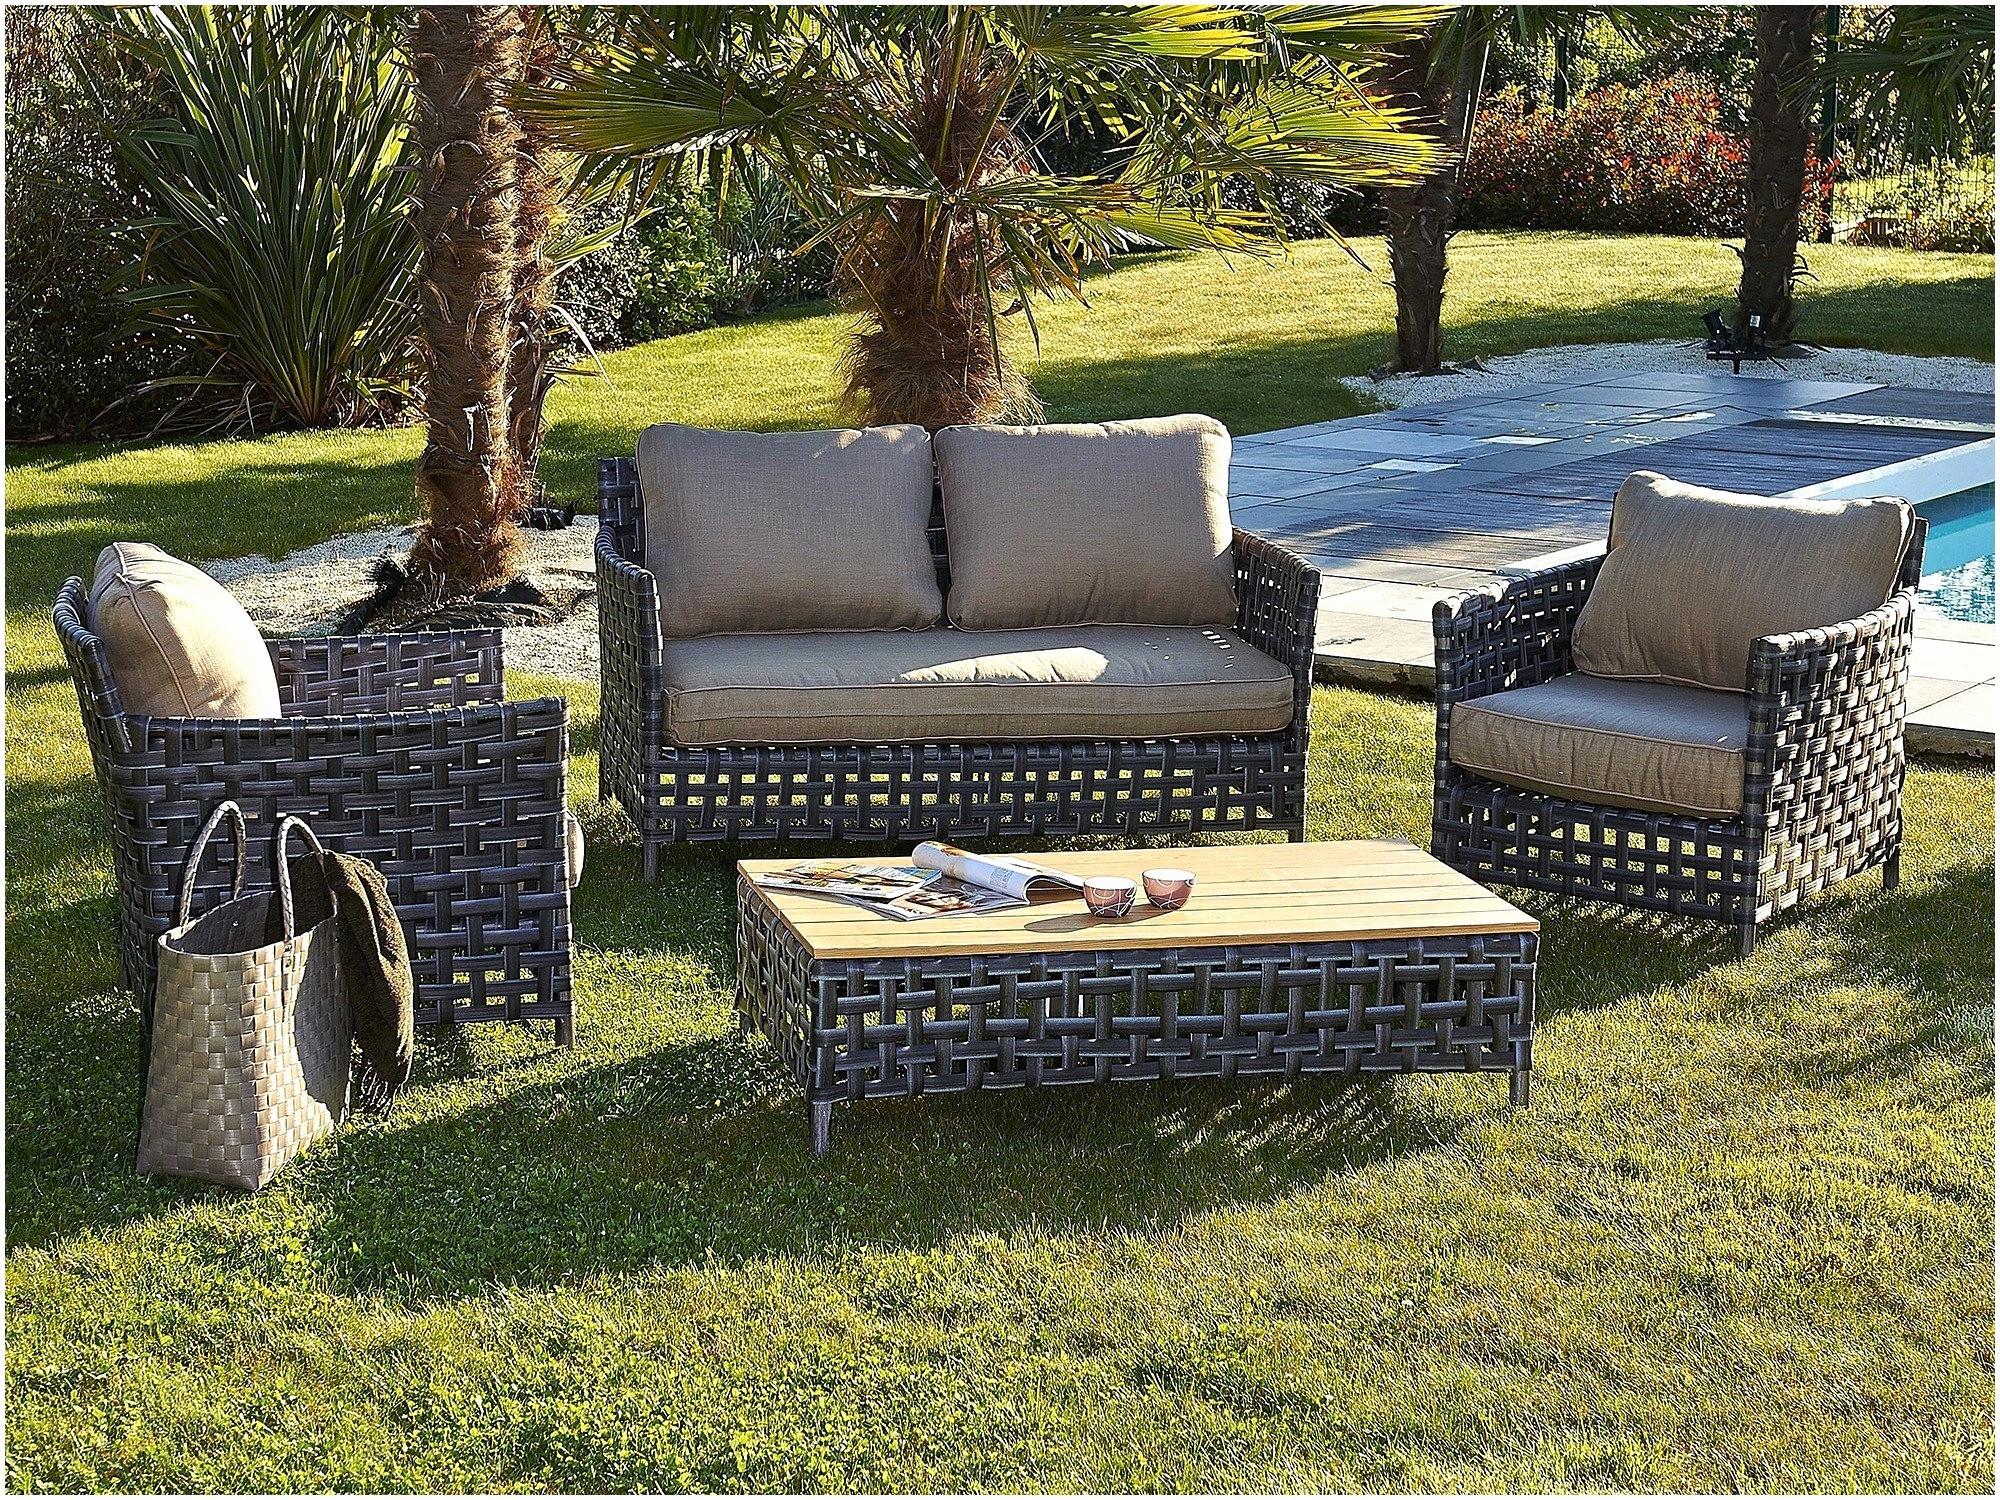 Mobilier jardin hesperide nouveau meubles de jardin - Mobilier jardin hesperide ...